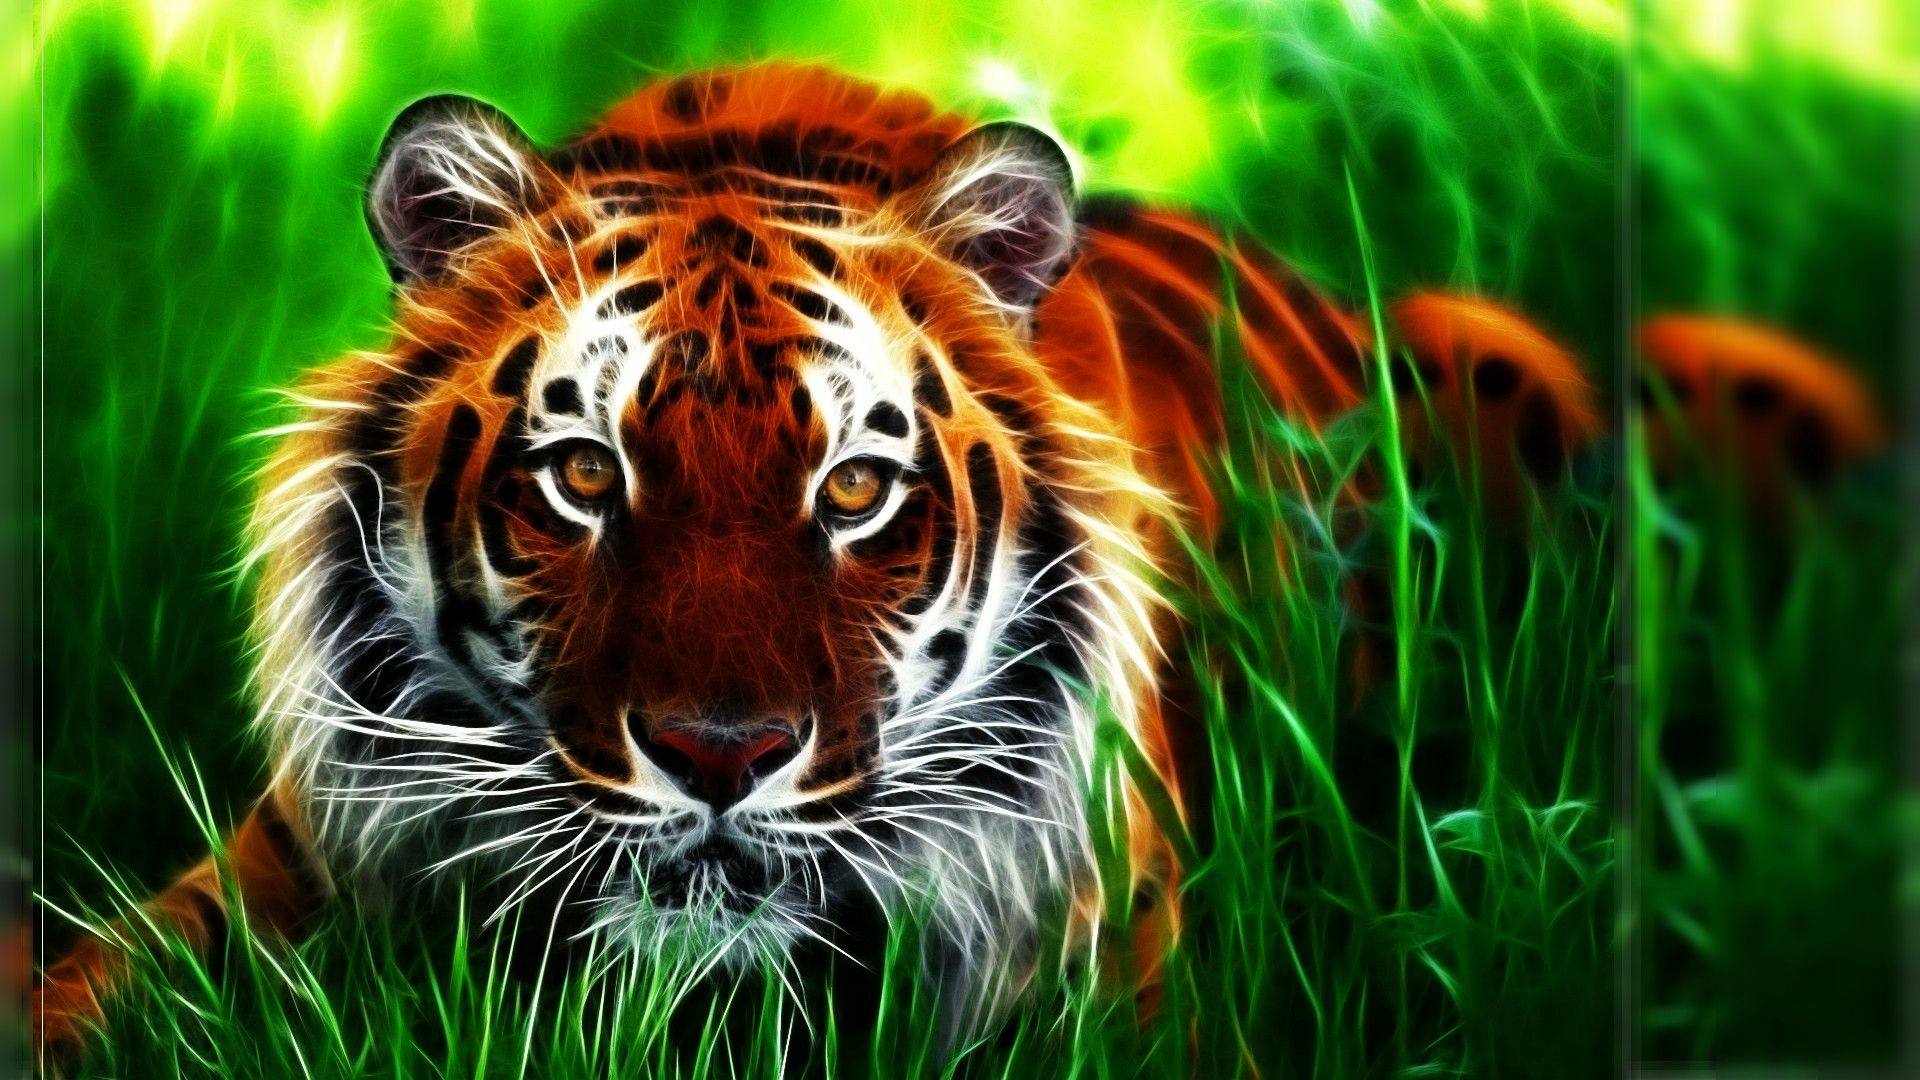 d tiger photoshop fractal wallpaper 960×640 green tiger wallpapers